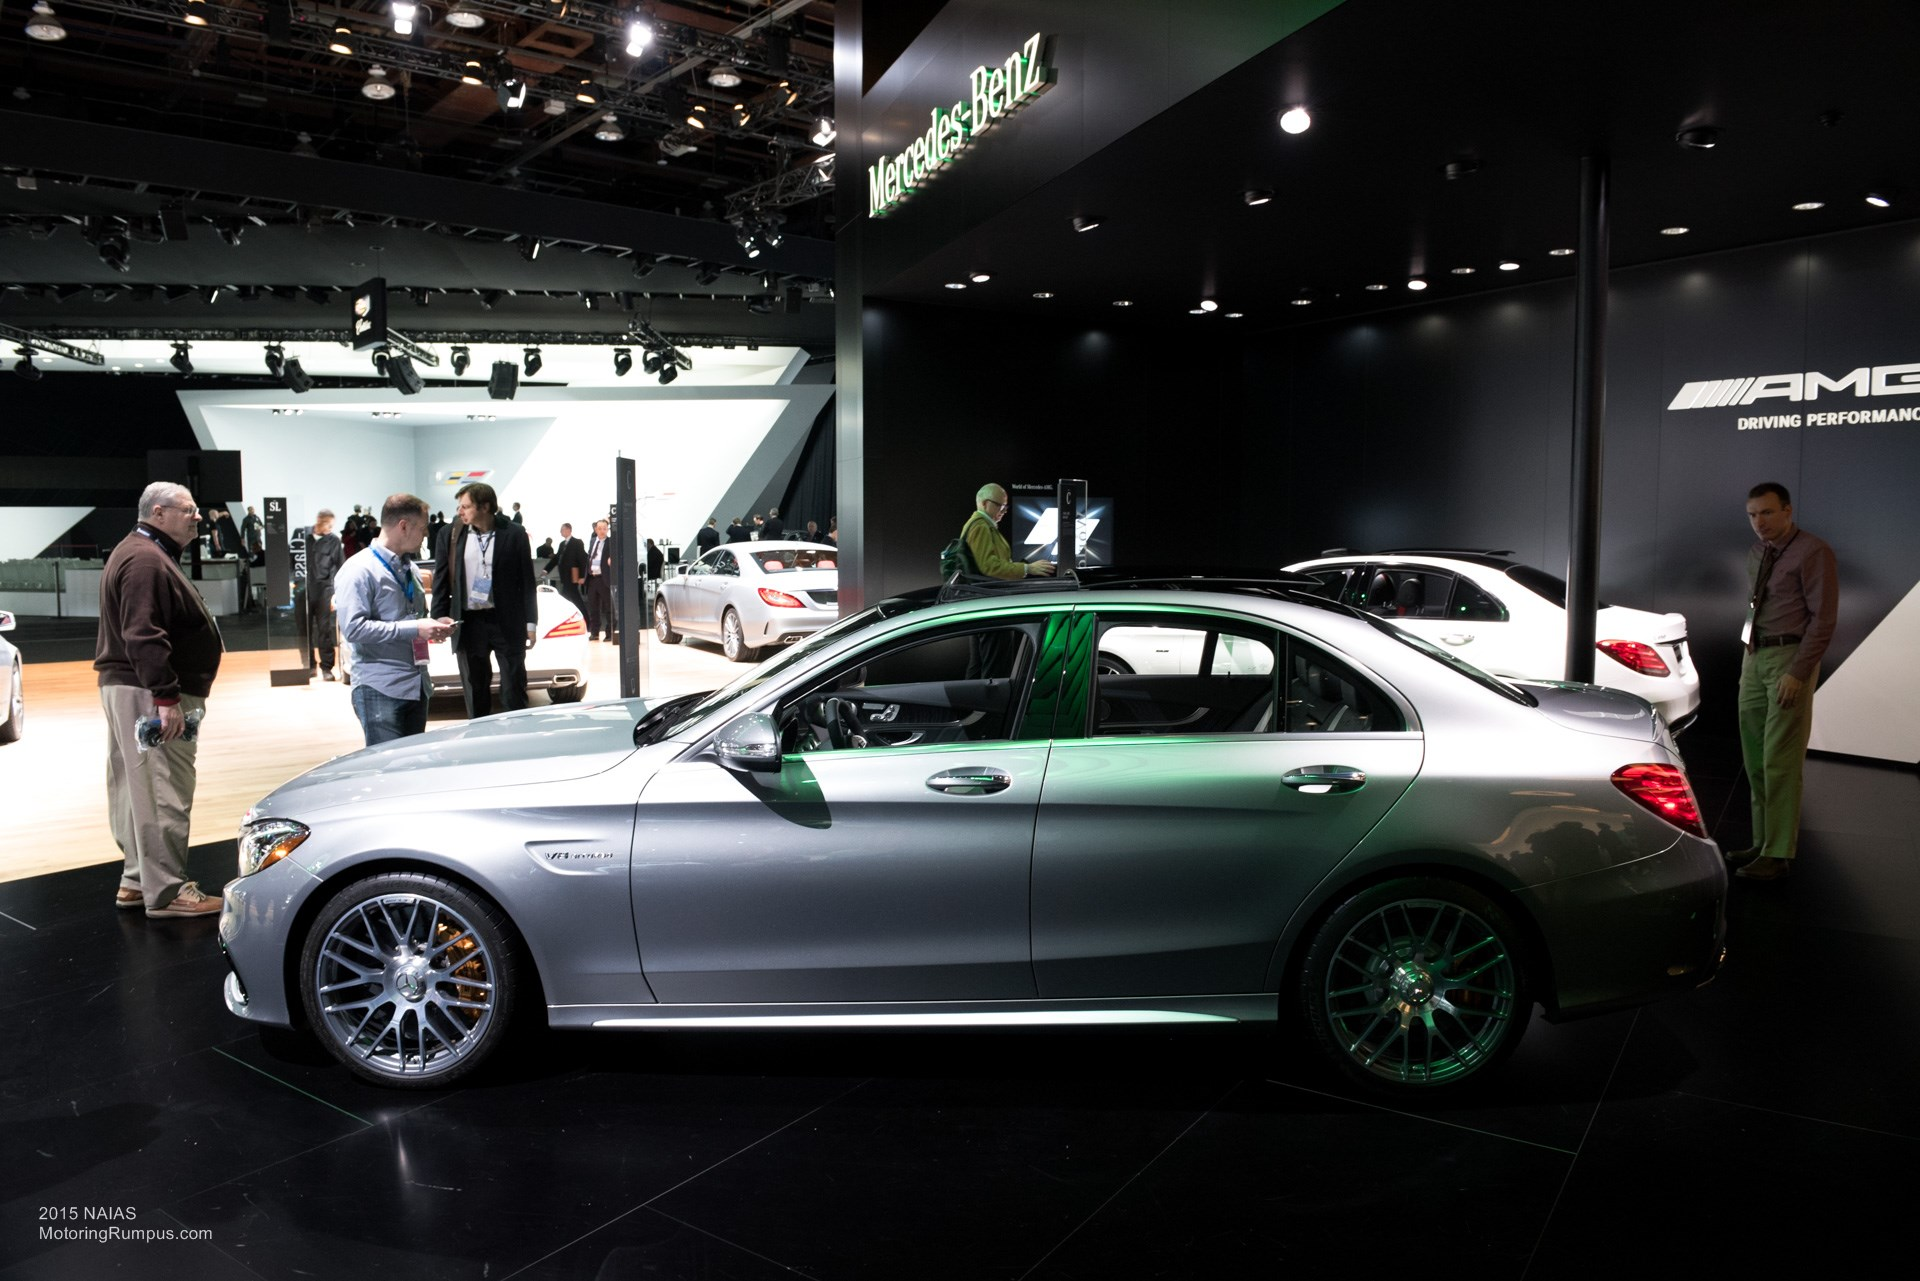 2015 NAIAS Mercedes-AMG C63 S